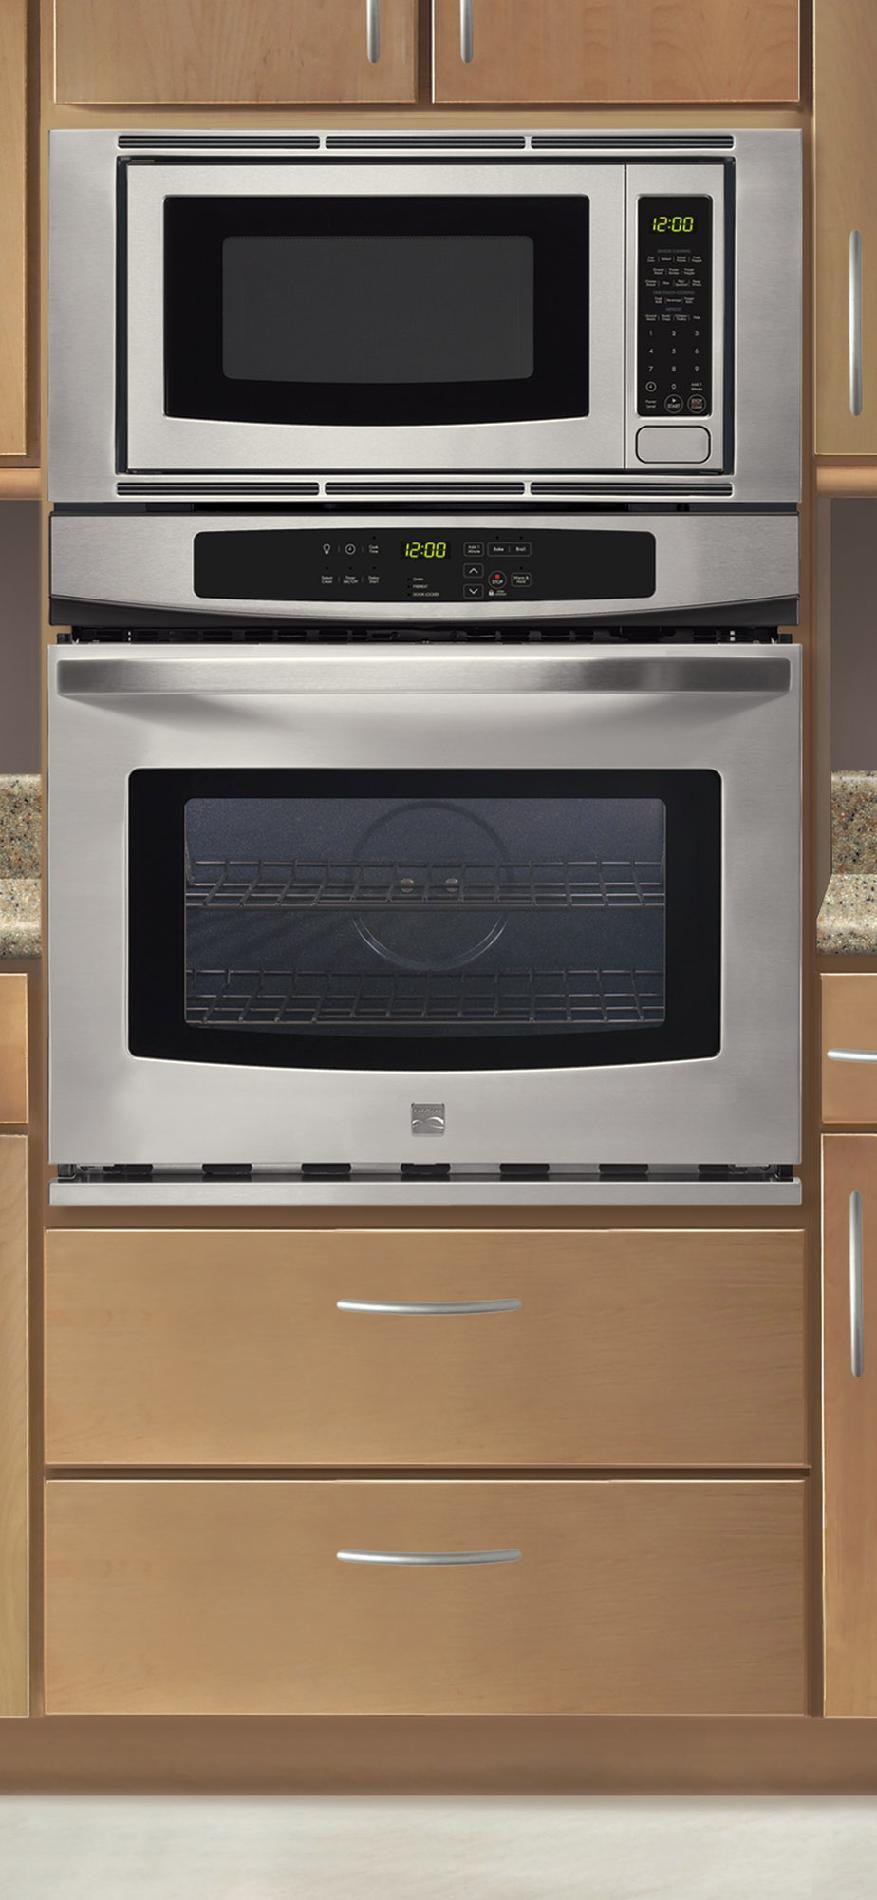 Ge Monogram Oven Wiring Diagram Kenmore Wall Oven Microwave Combo Bestmicrowave